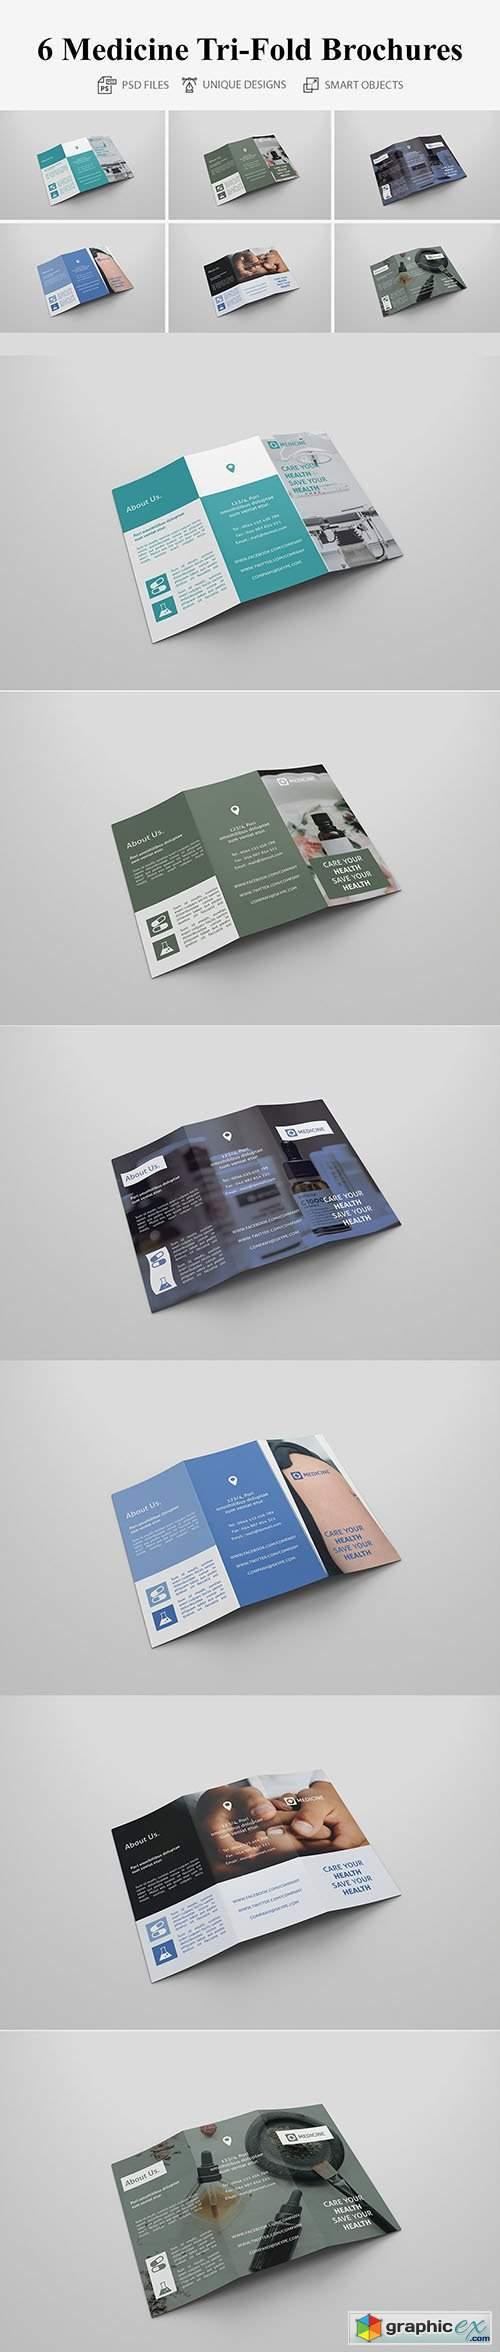 6 Medicine Tri Fold Bochures